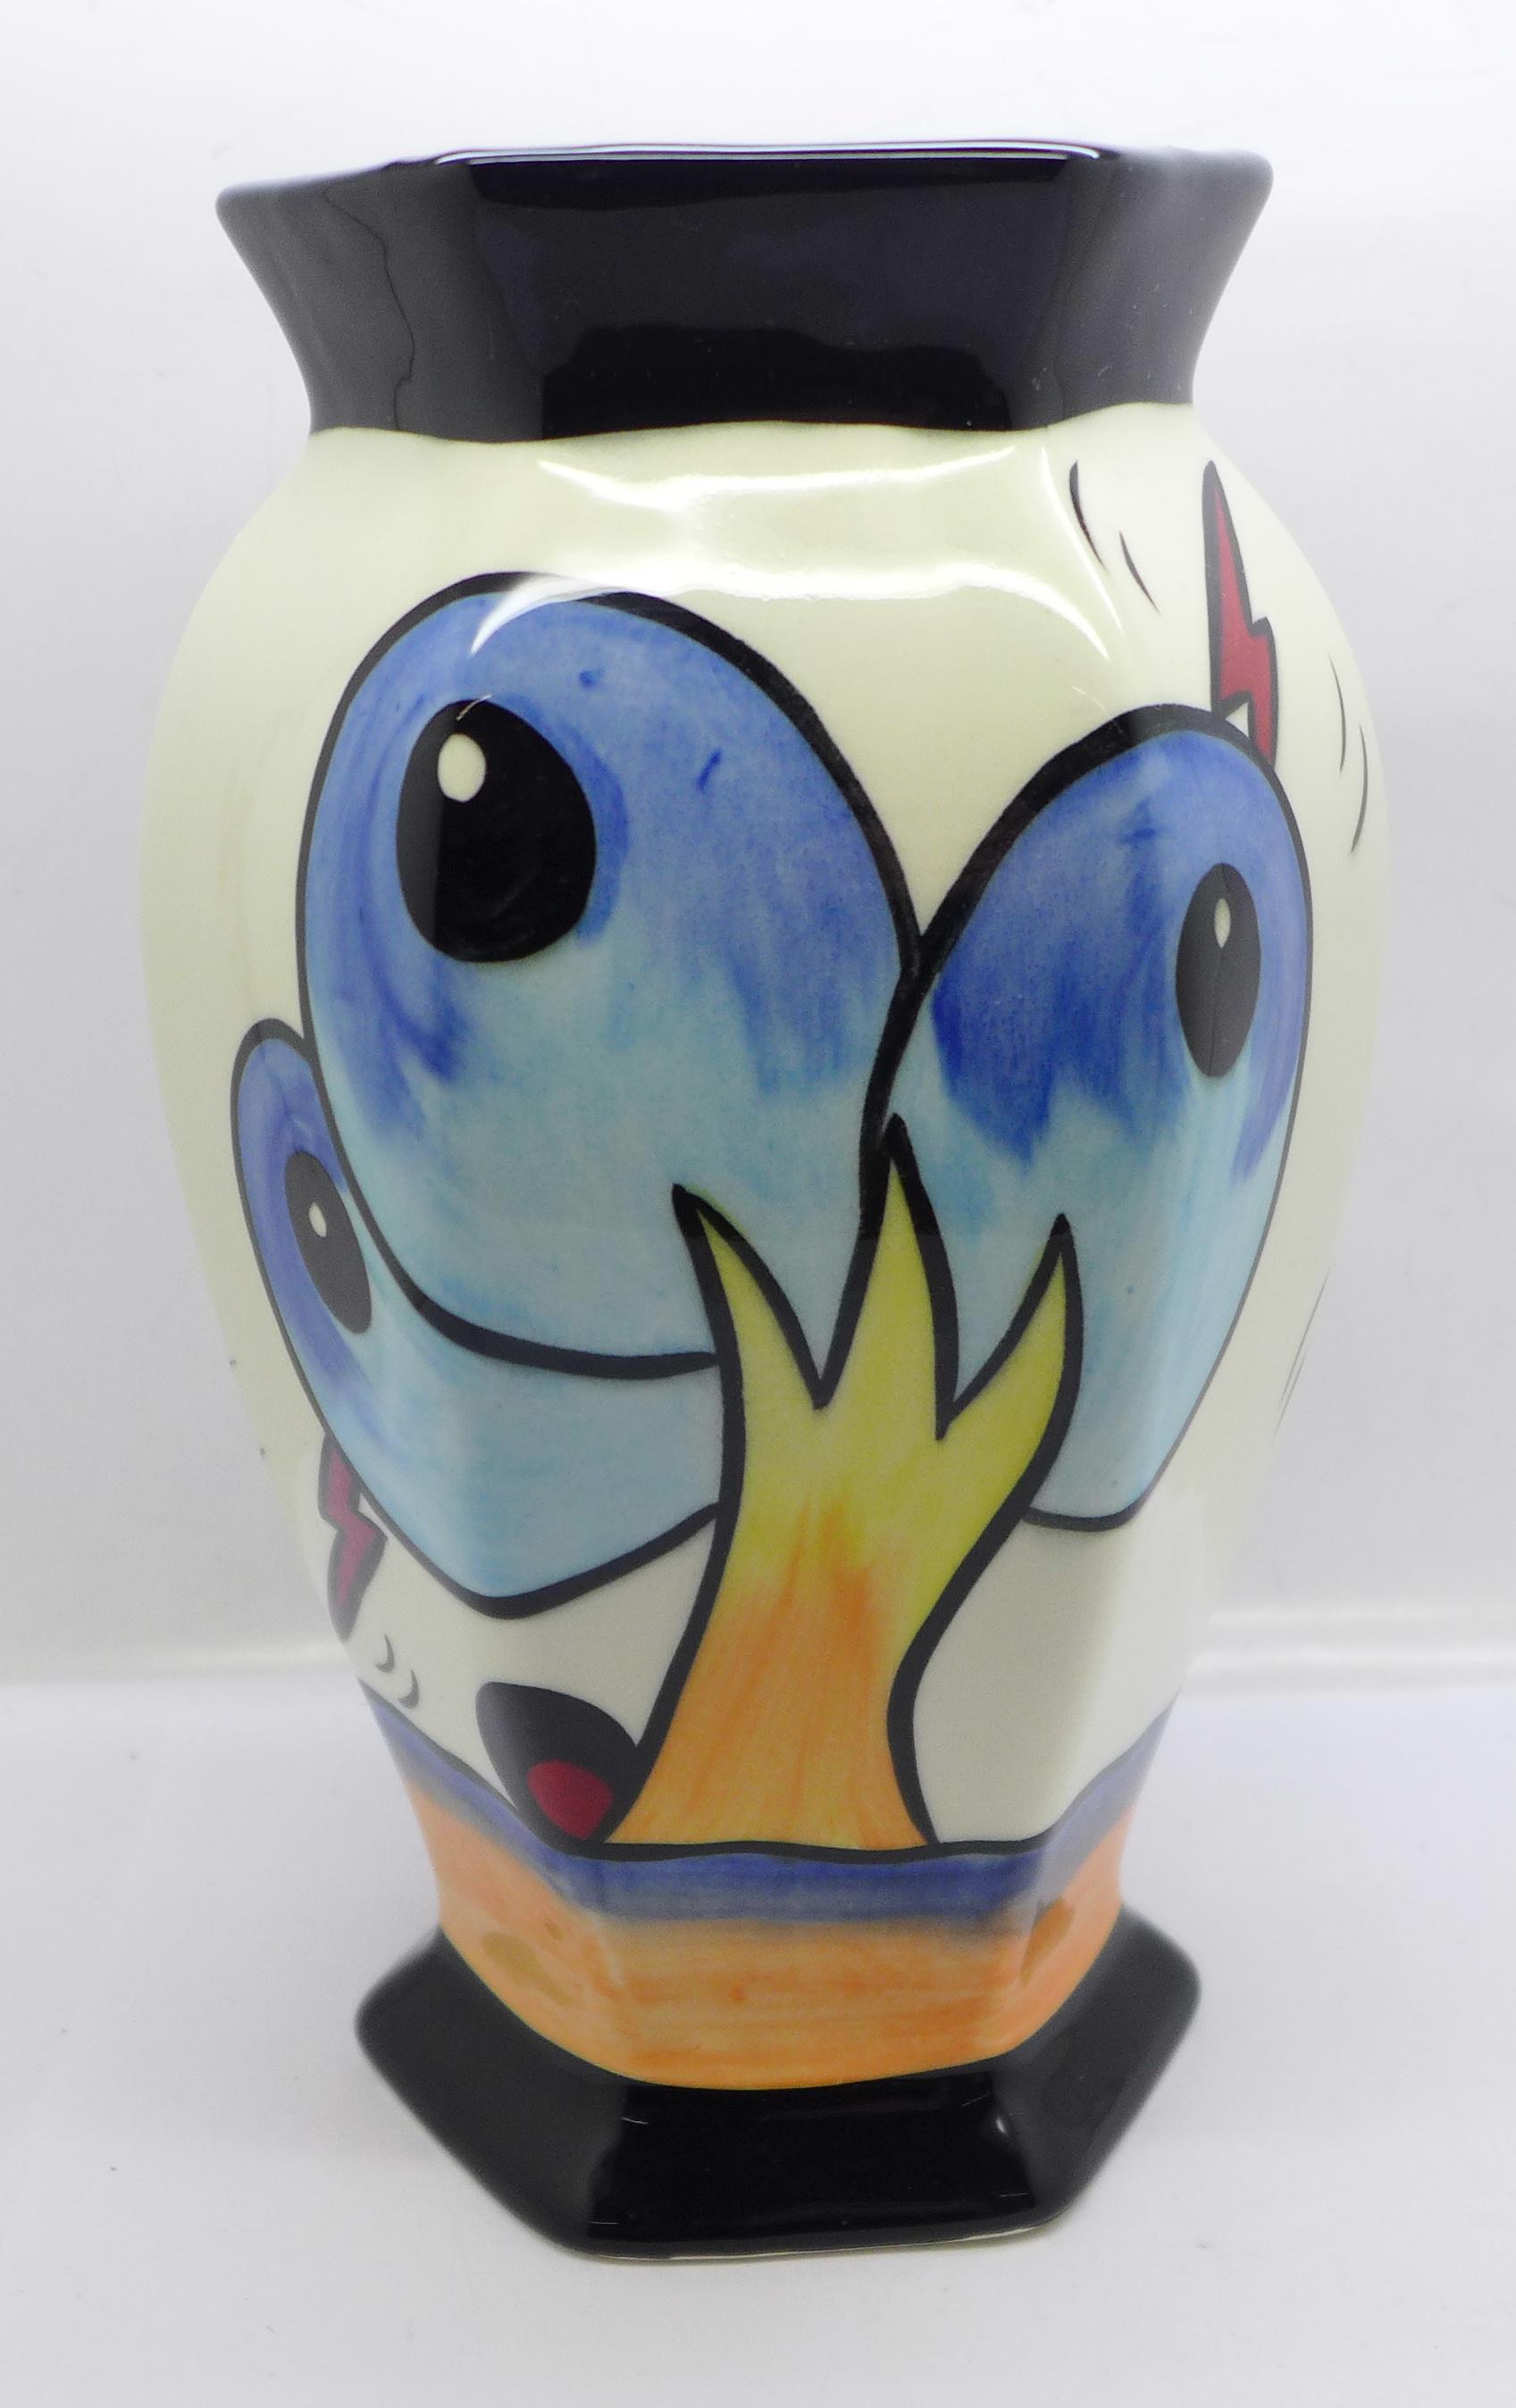 Lorna Bailey Pottery, hexagonal vase in the 'Bursley Way' design, 'Lorna Bailey' signature on the